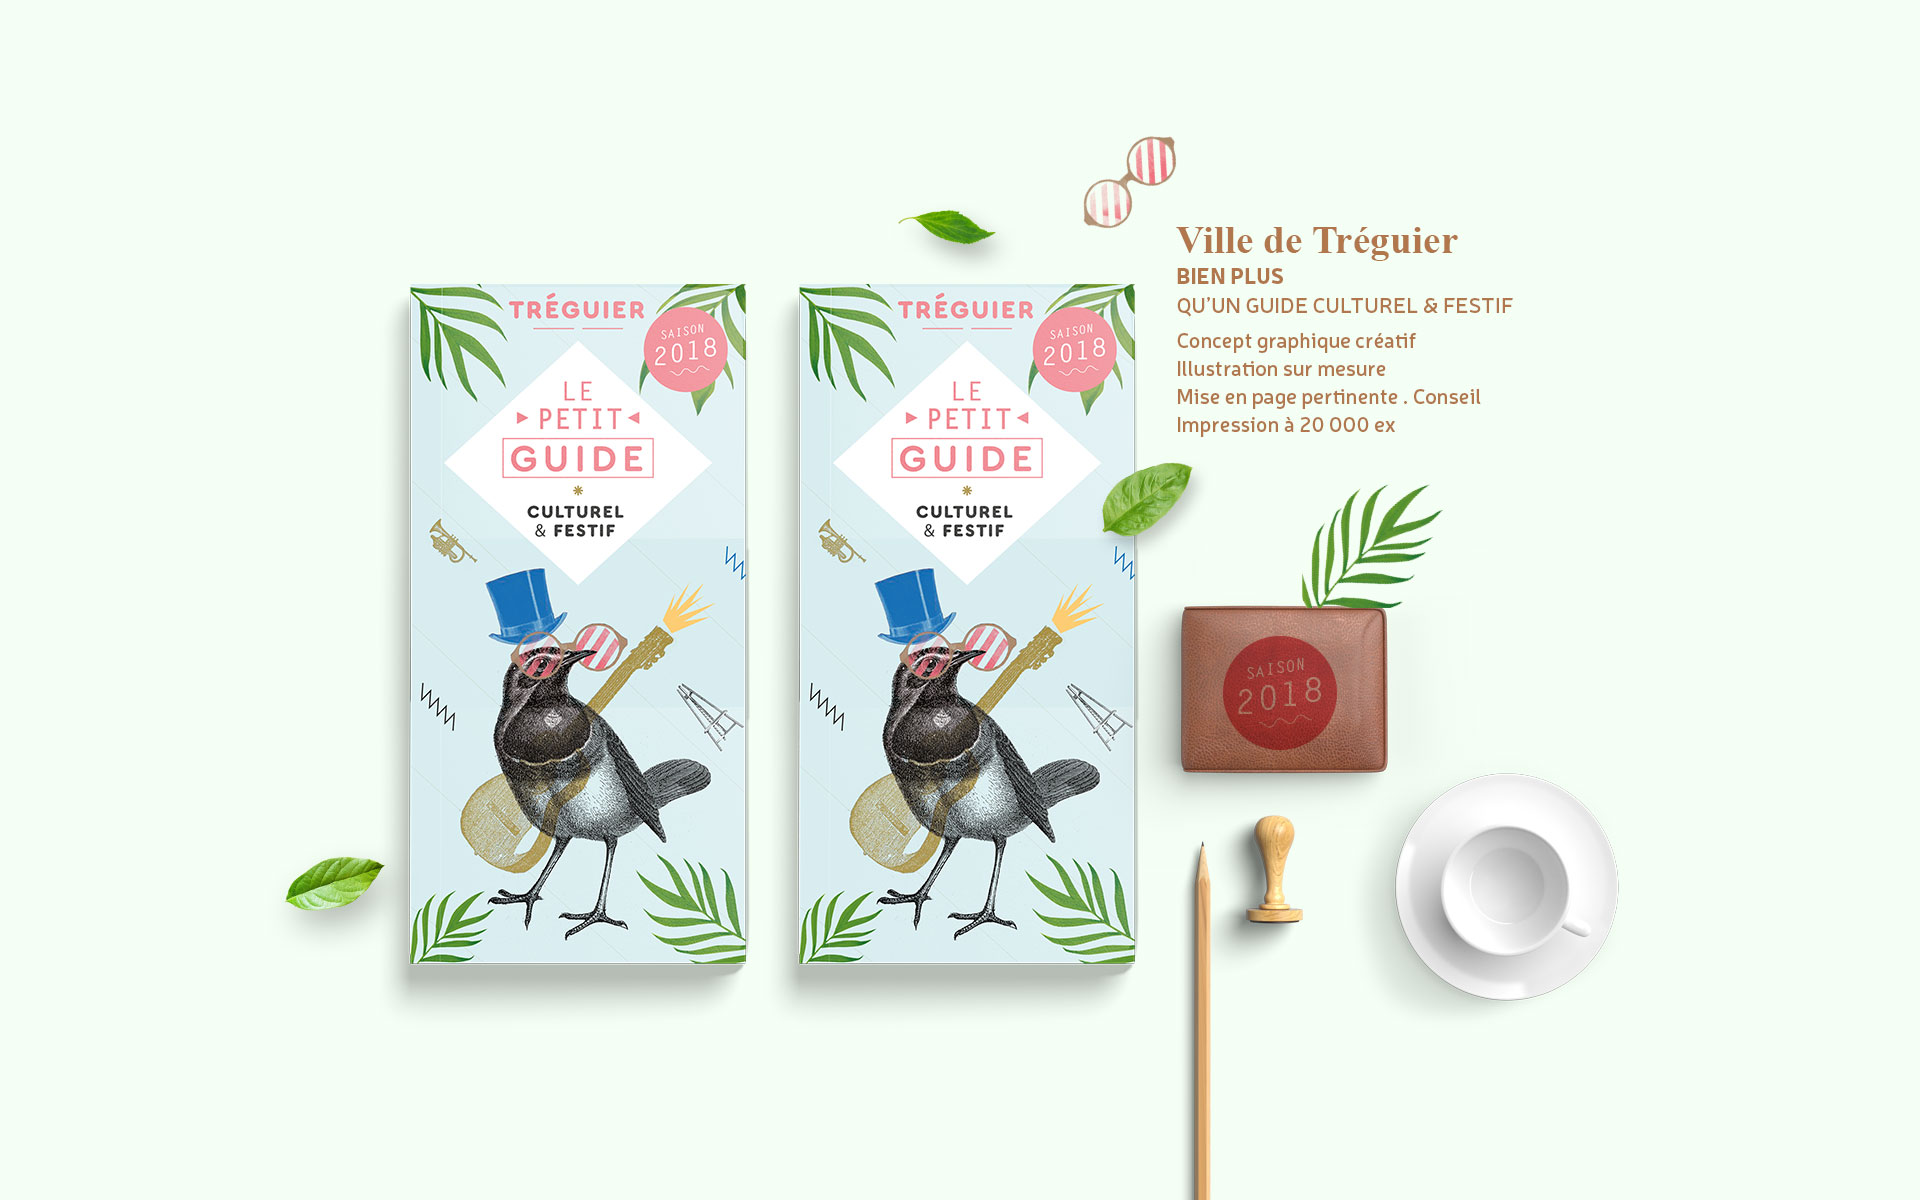 Coqueliko-Tréguier-Guide-culturel